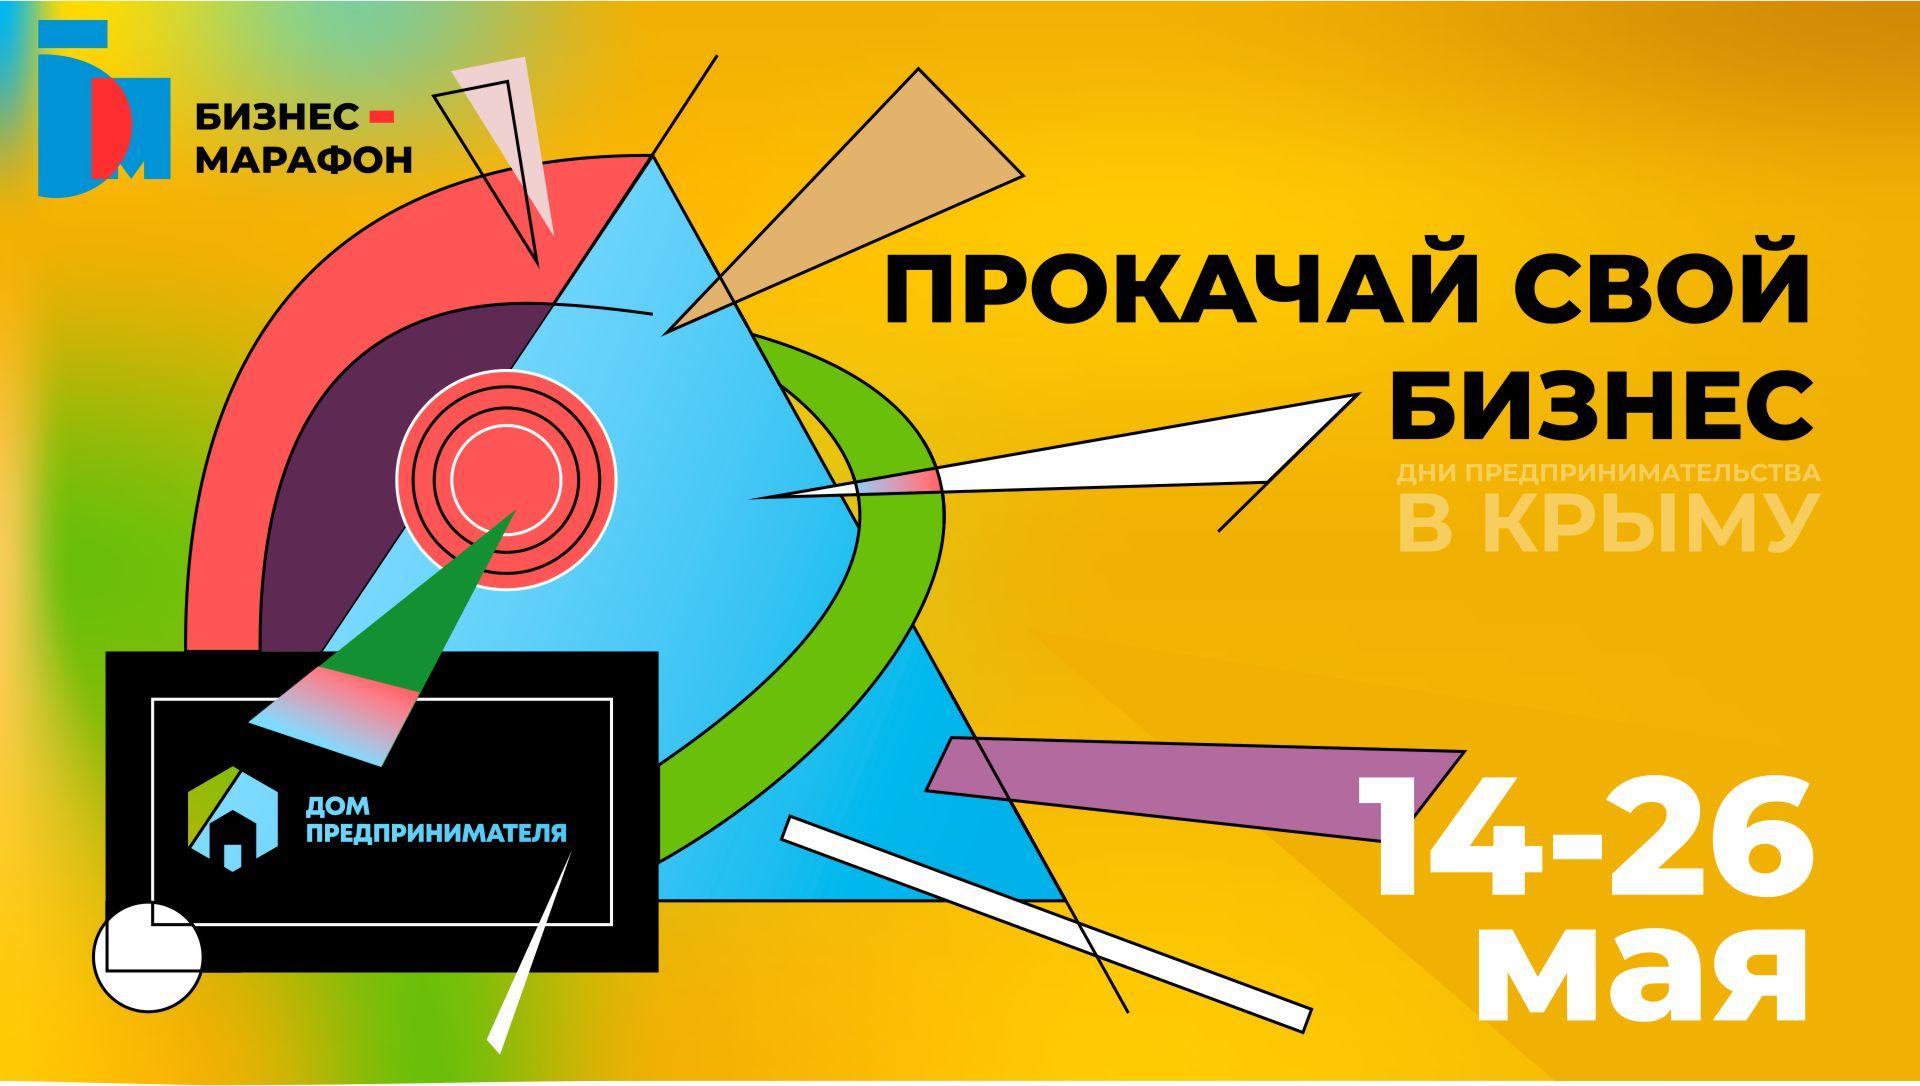 Афиша 2 Бизнес-марафон